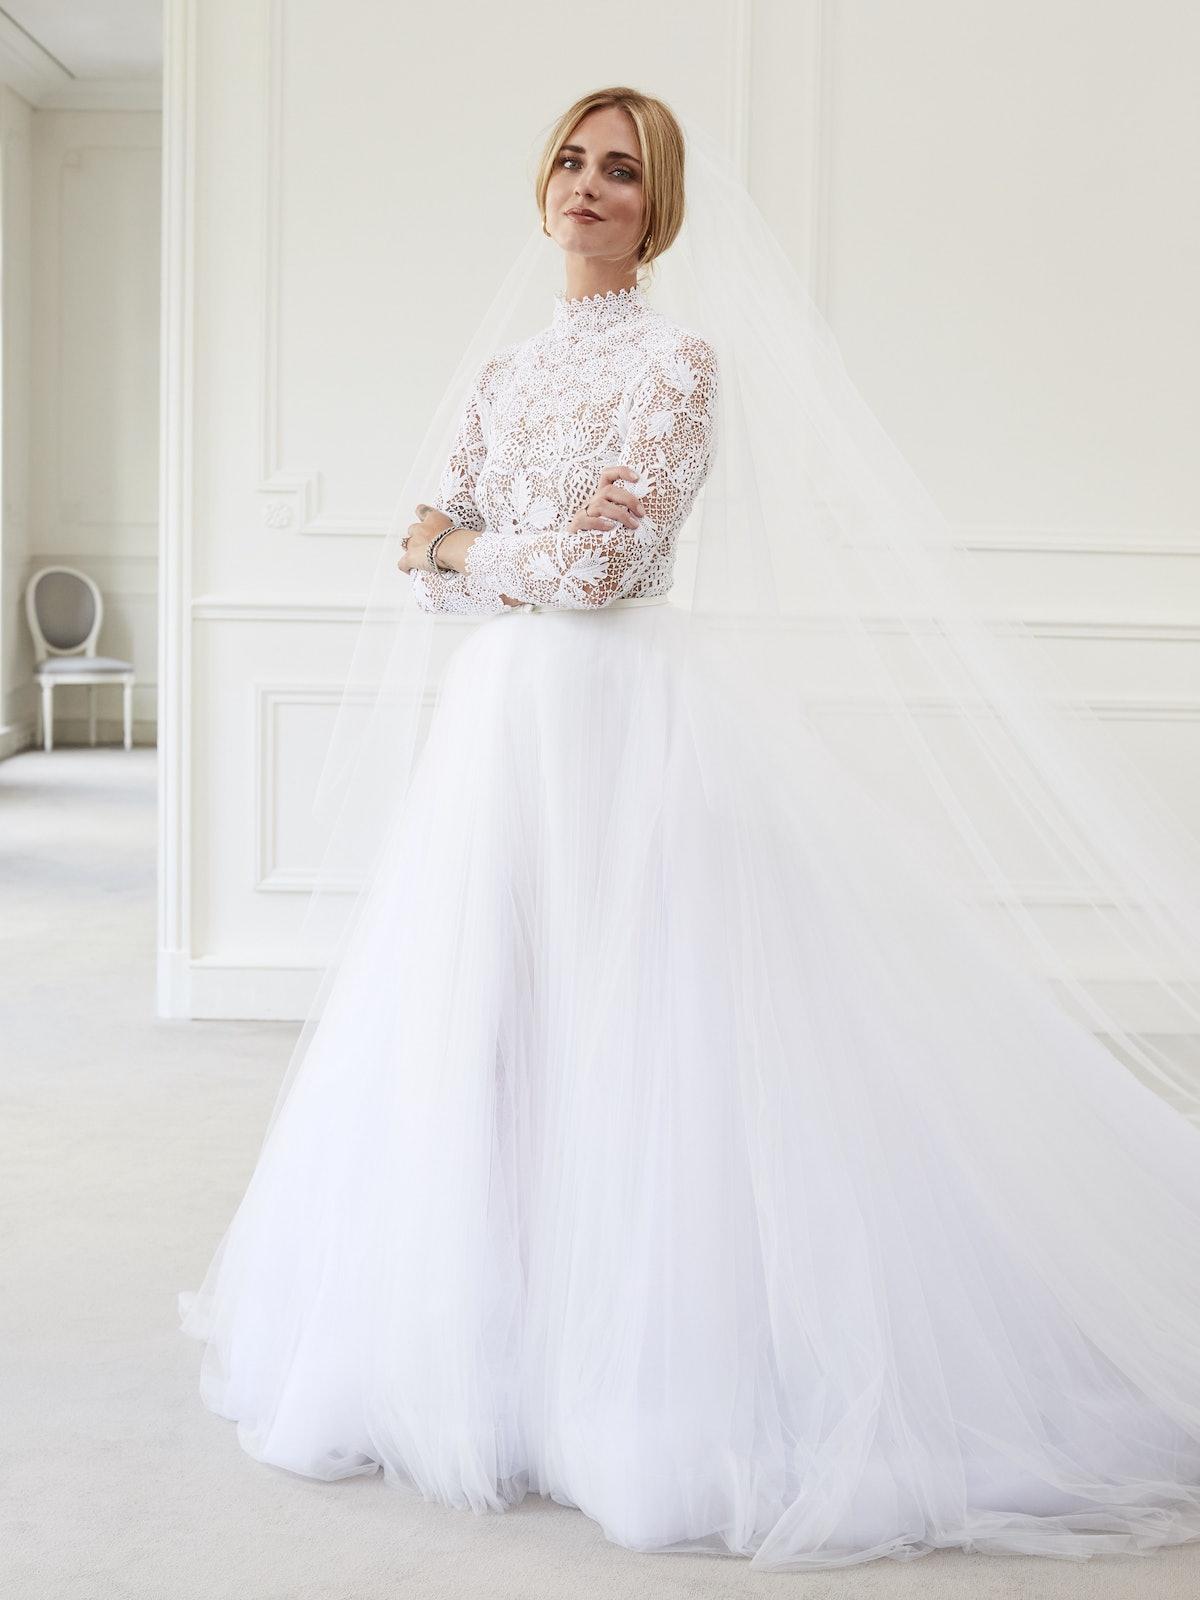 DIOR_CHIARA_FERRAGNI_WEDDING_GRANDS SALONS_© JOHAN SANDBERG_1.jpg